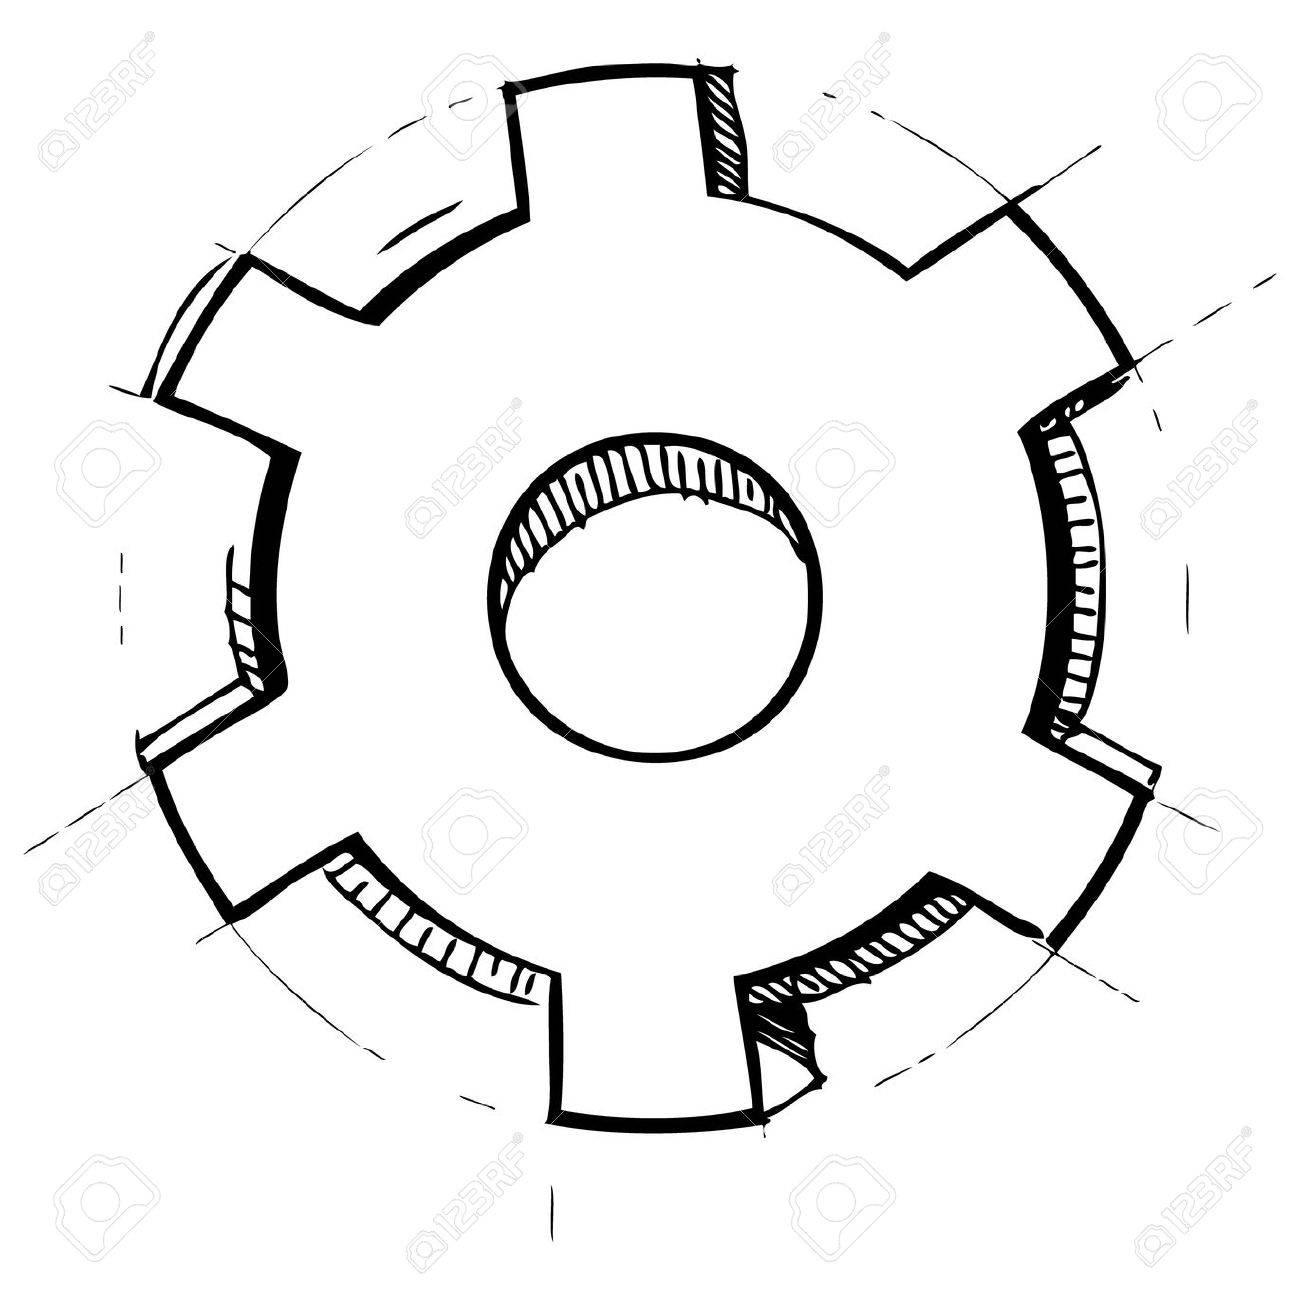 Hand drawn gear Stock Vector - 18031117